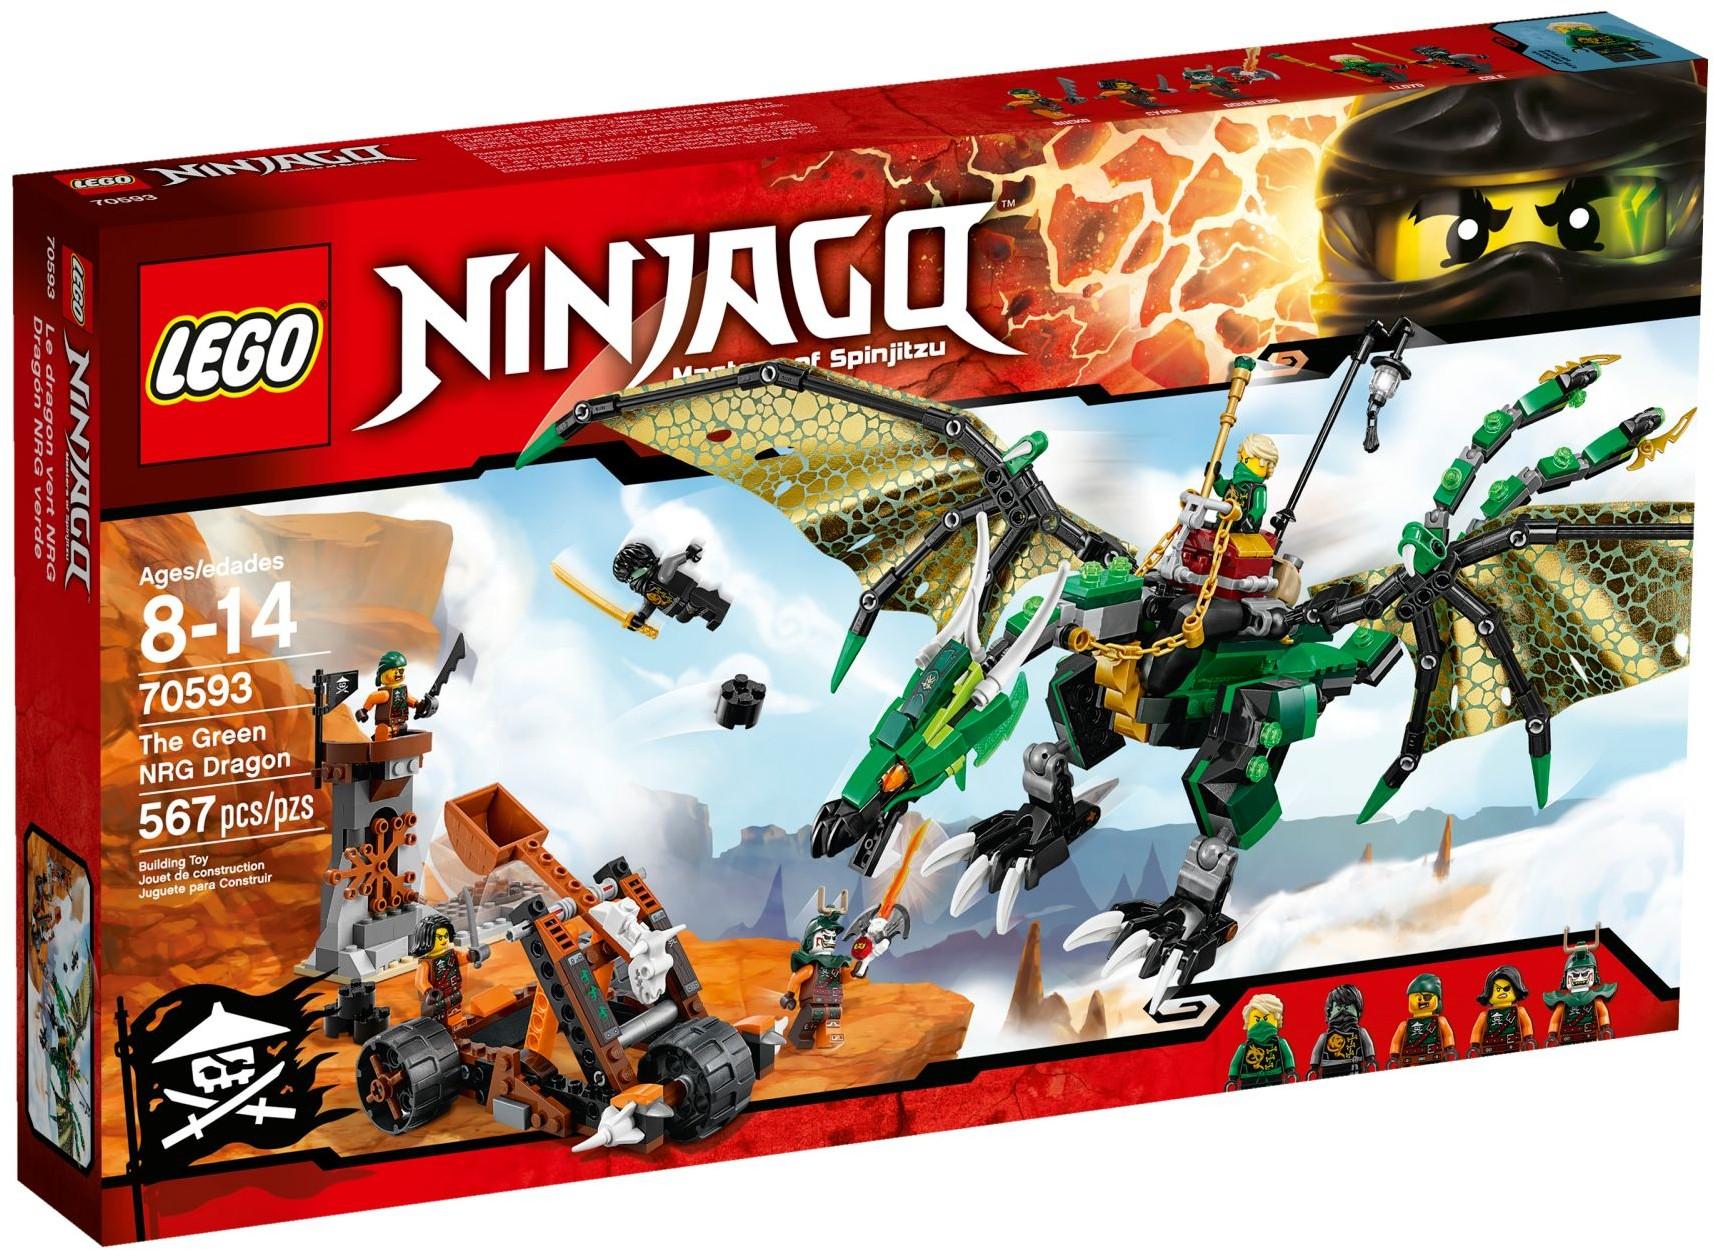 70593 The Green NRG Dragon